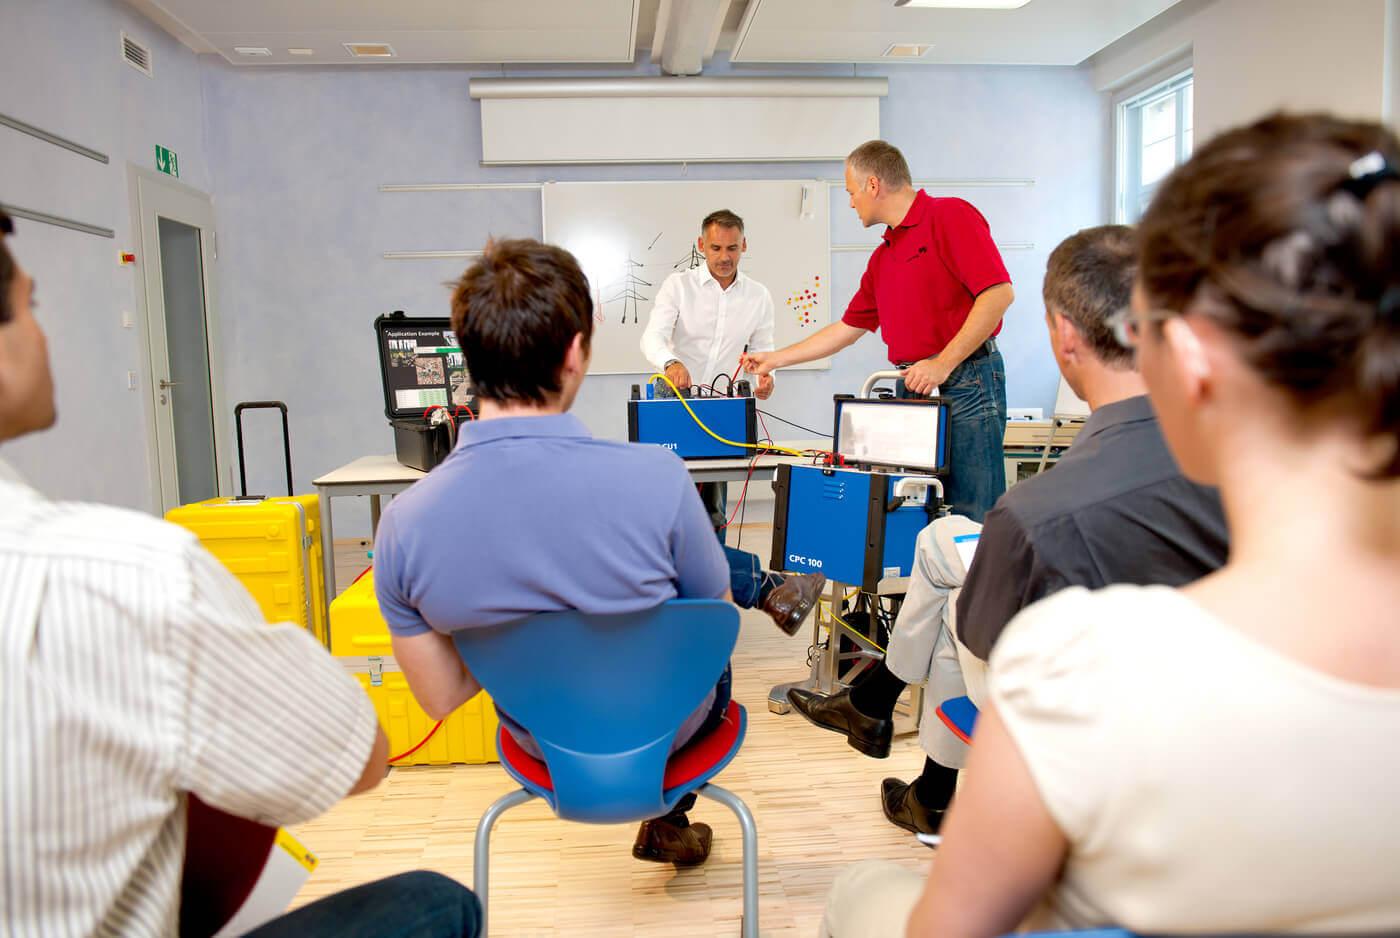 Training Course Evaluation